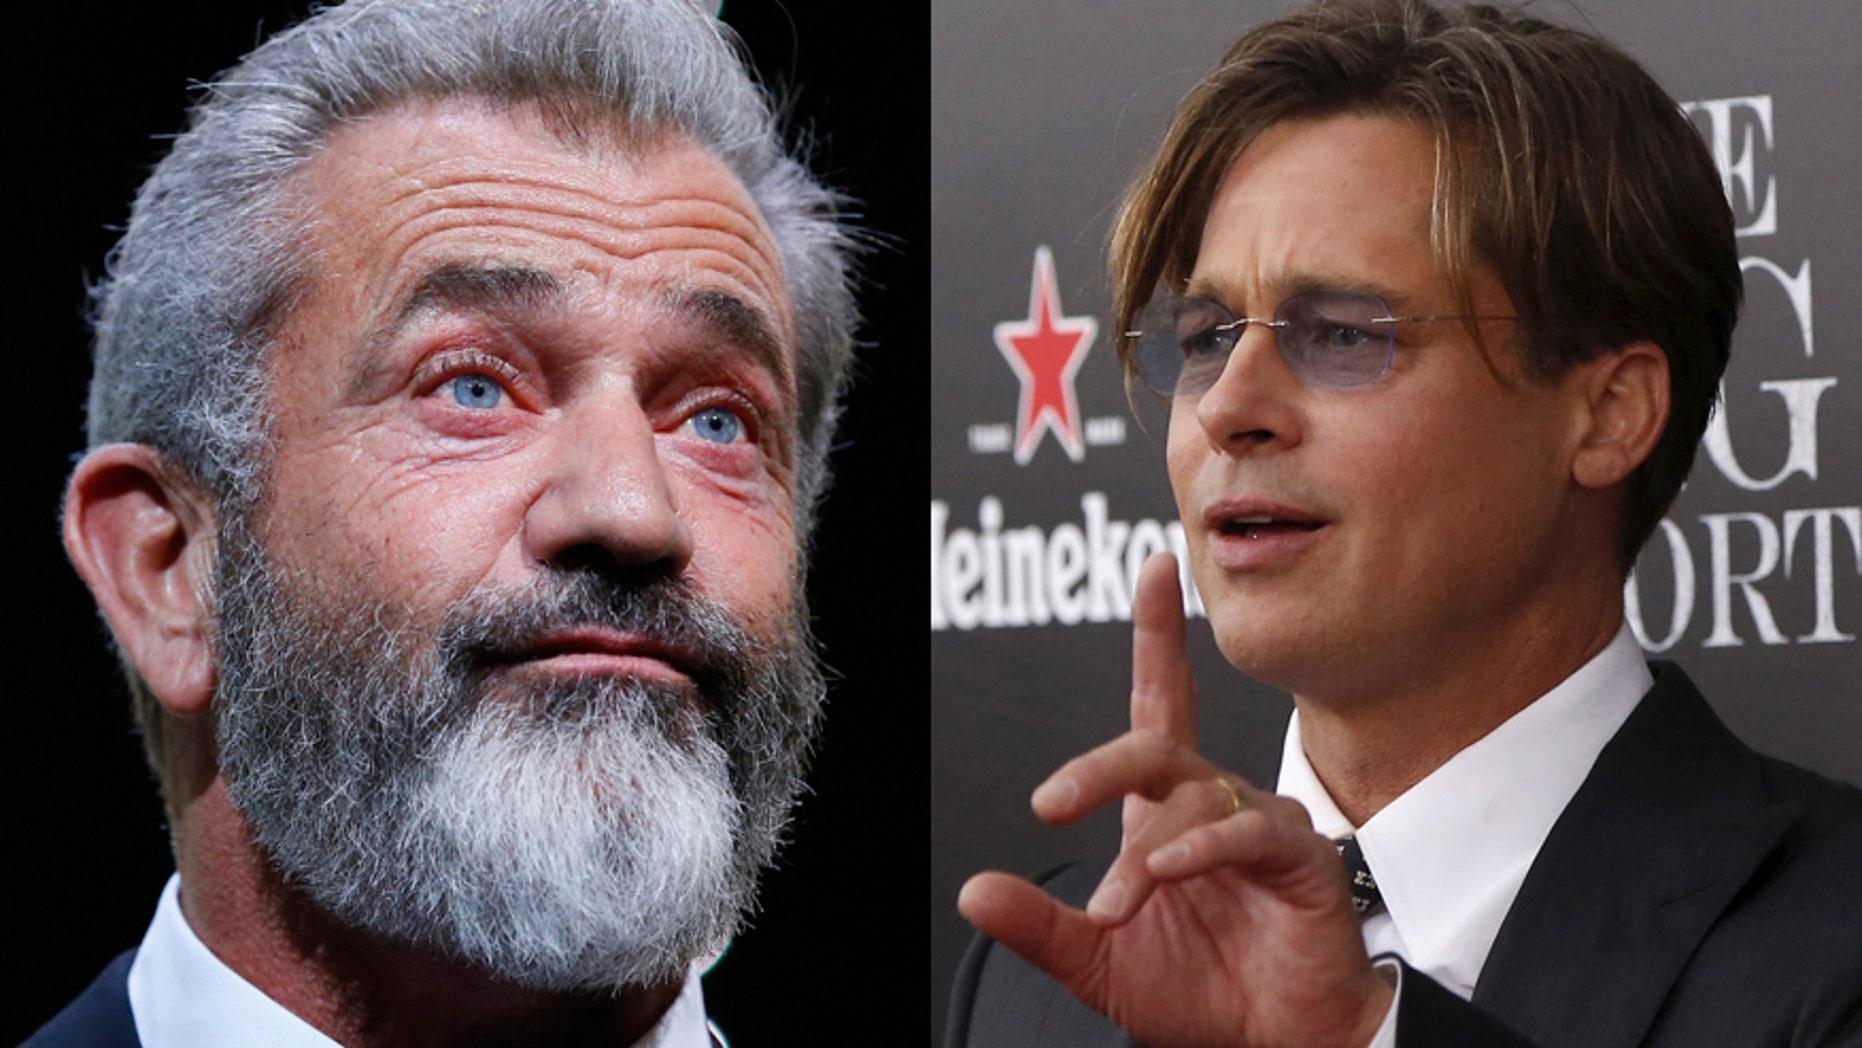 Director Mel Gibson (left) and actor Brad Pitt (right).